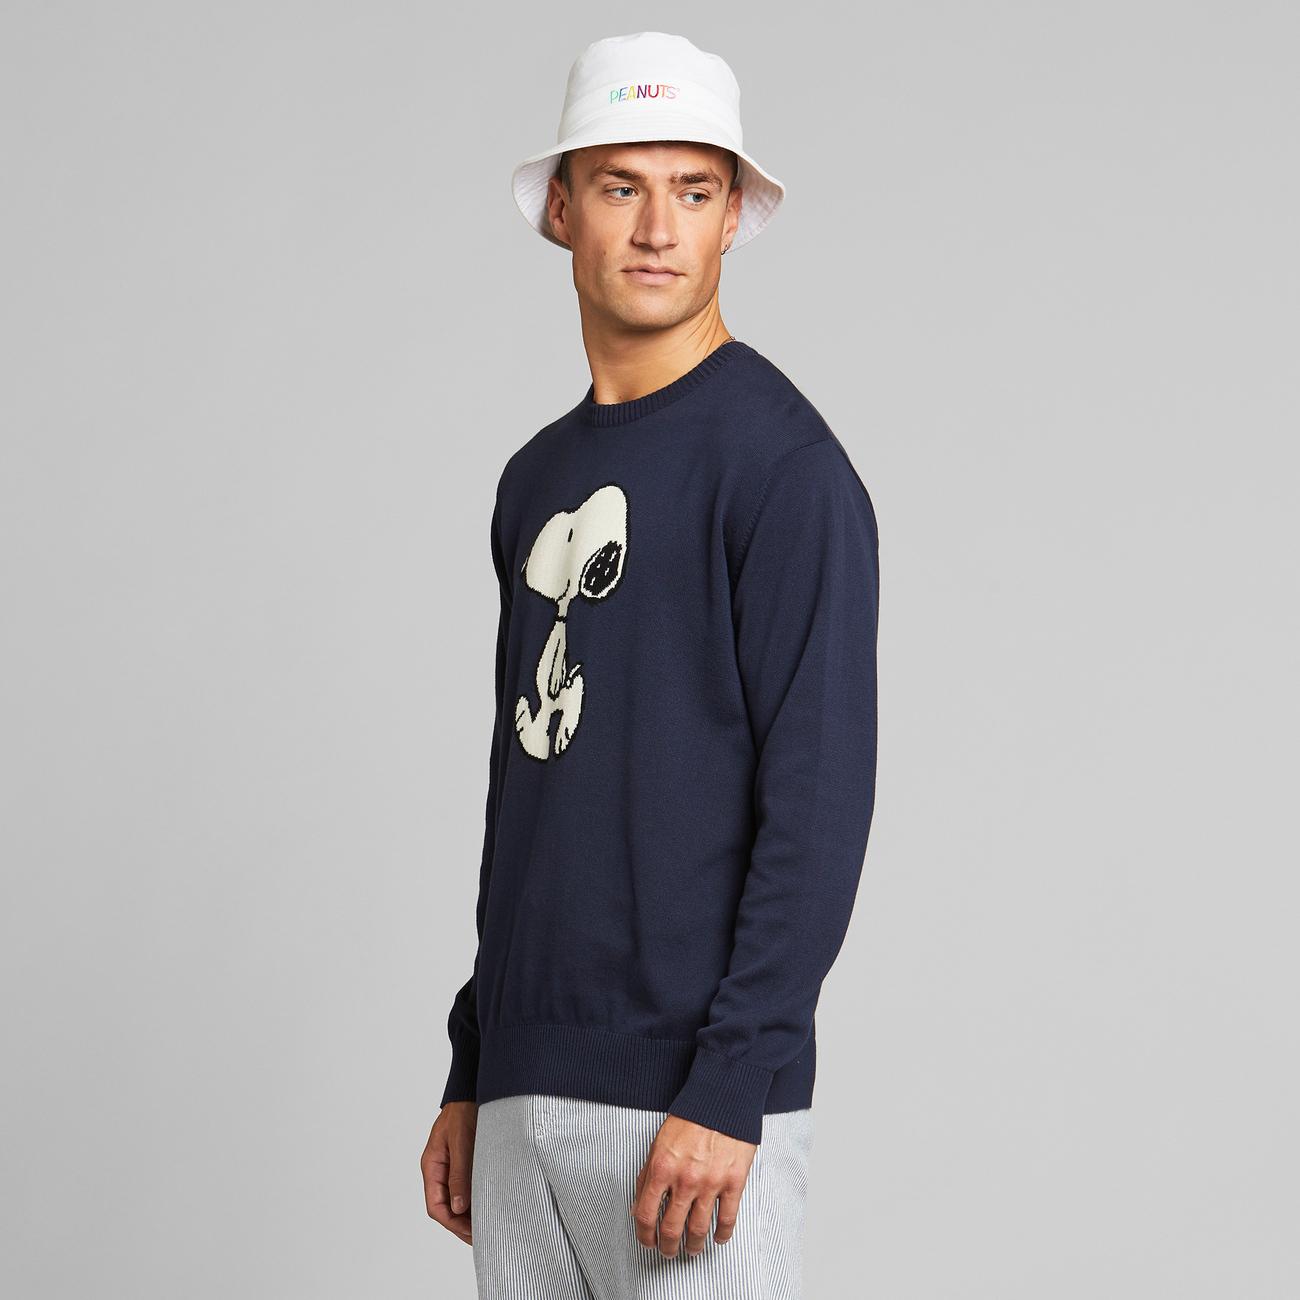 Sweater Mora Snoopy Navy